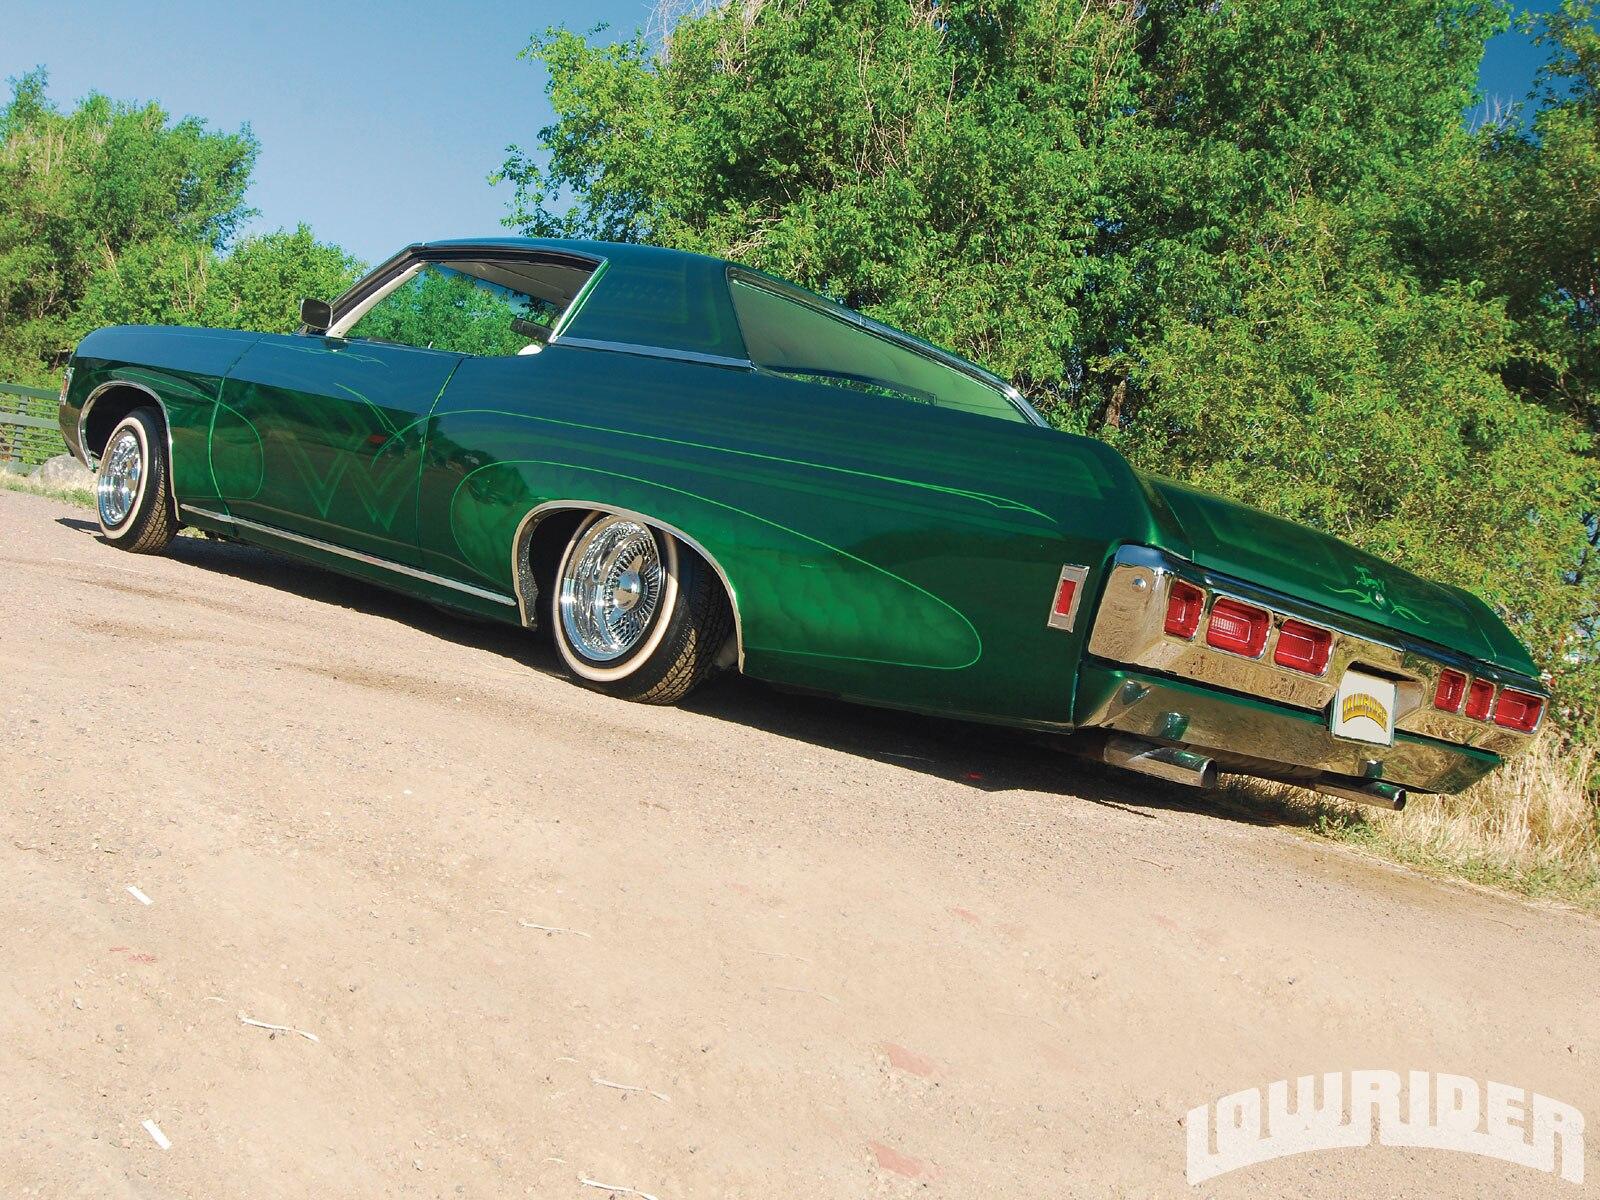 1103_lrmp_01_o-1969_chevrolet_impala-driver_side_rear_quarter_panel2